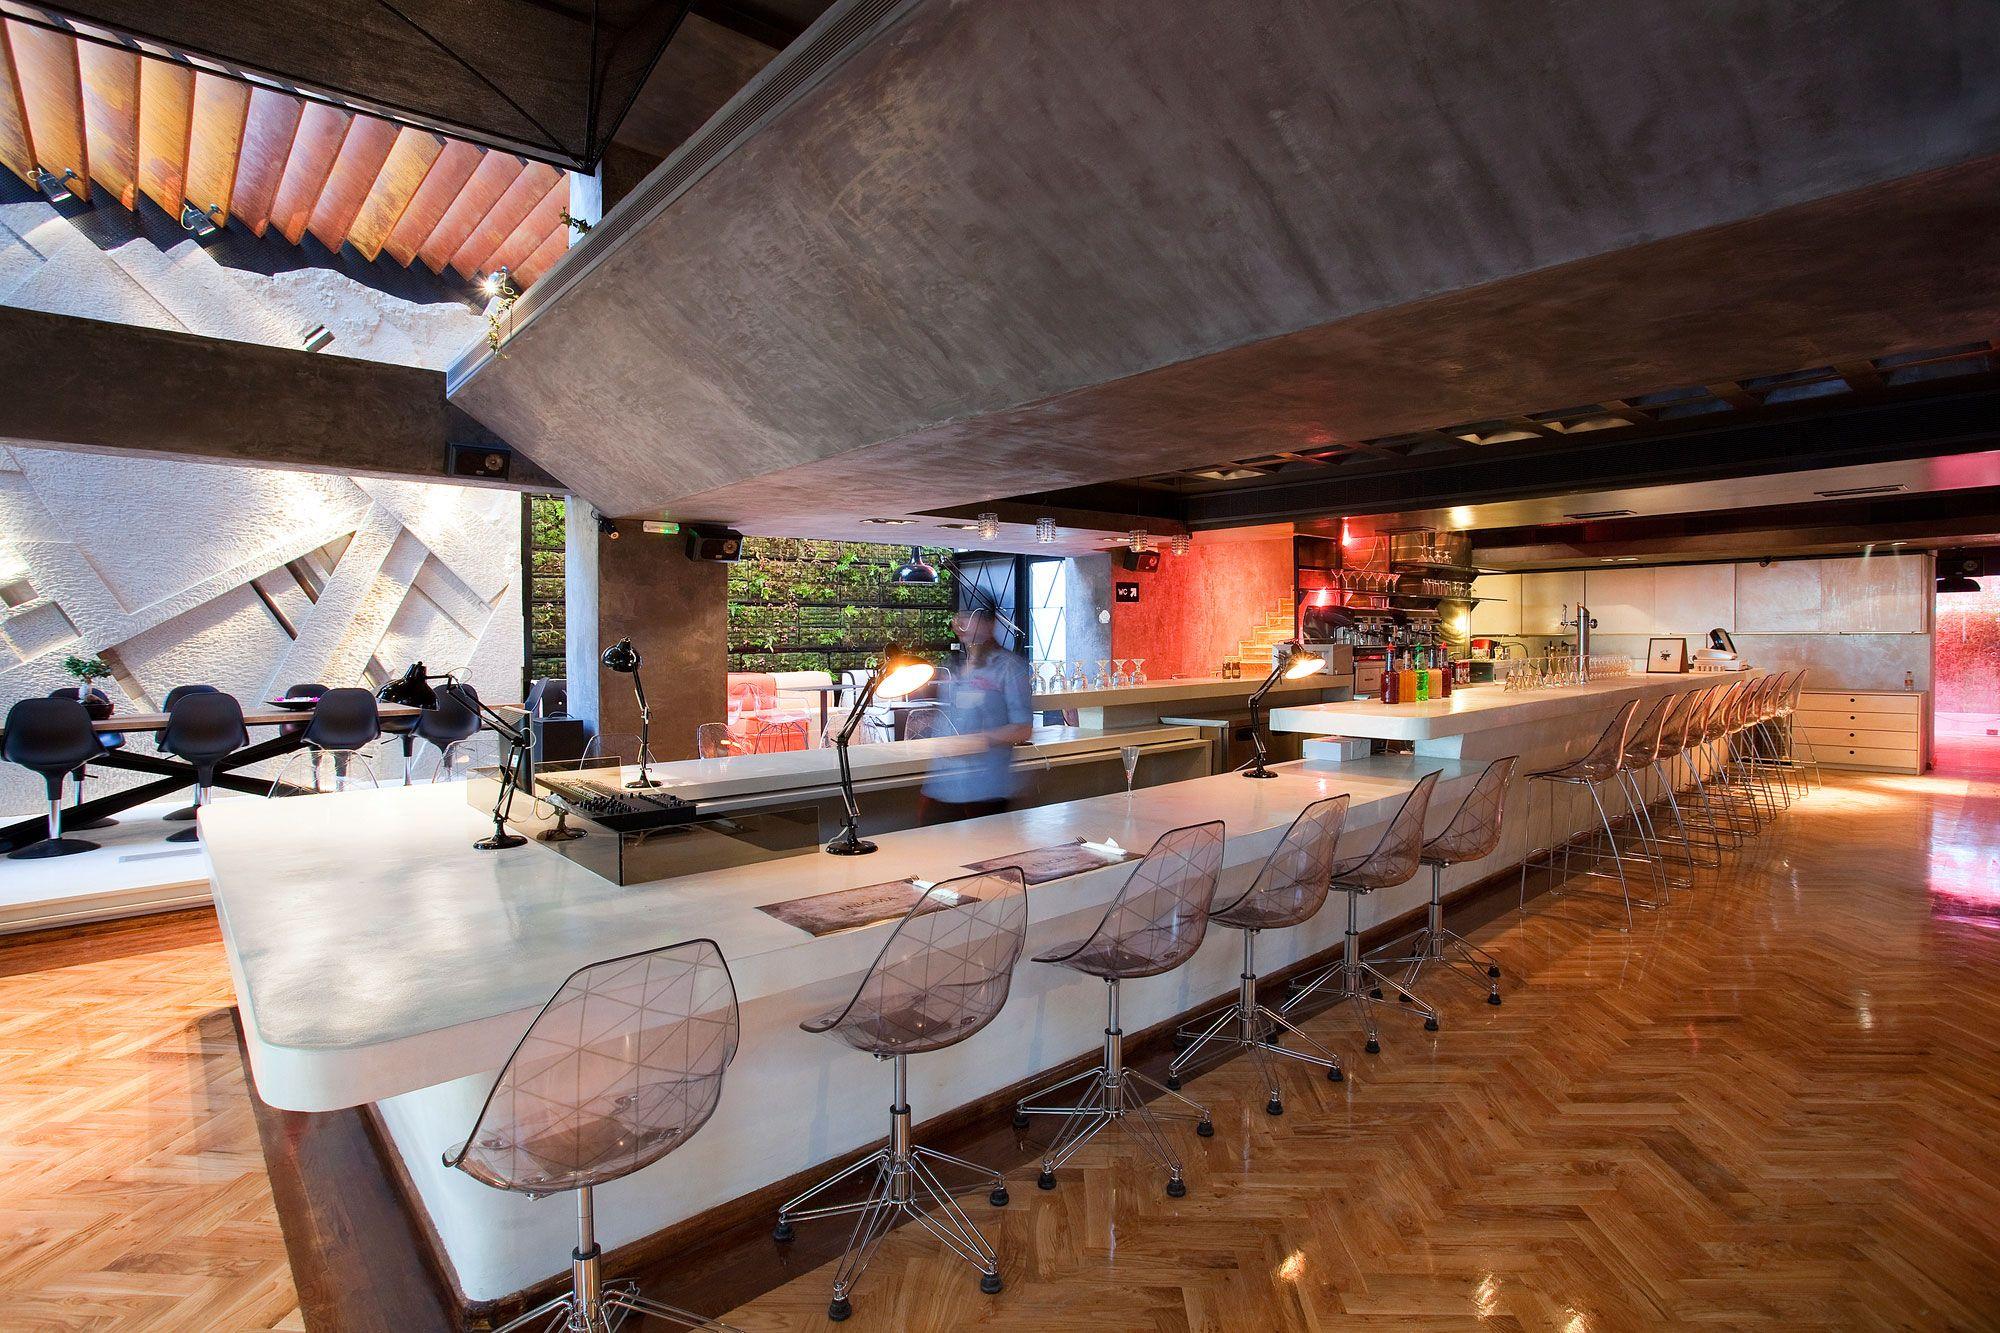 Coffee shop interior coffee shop interior cafeblue